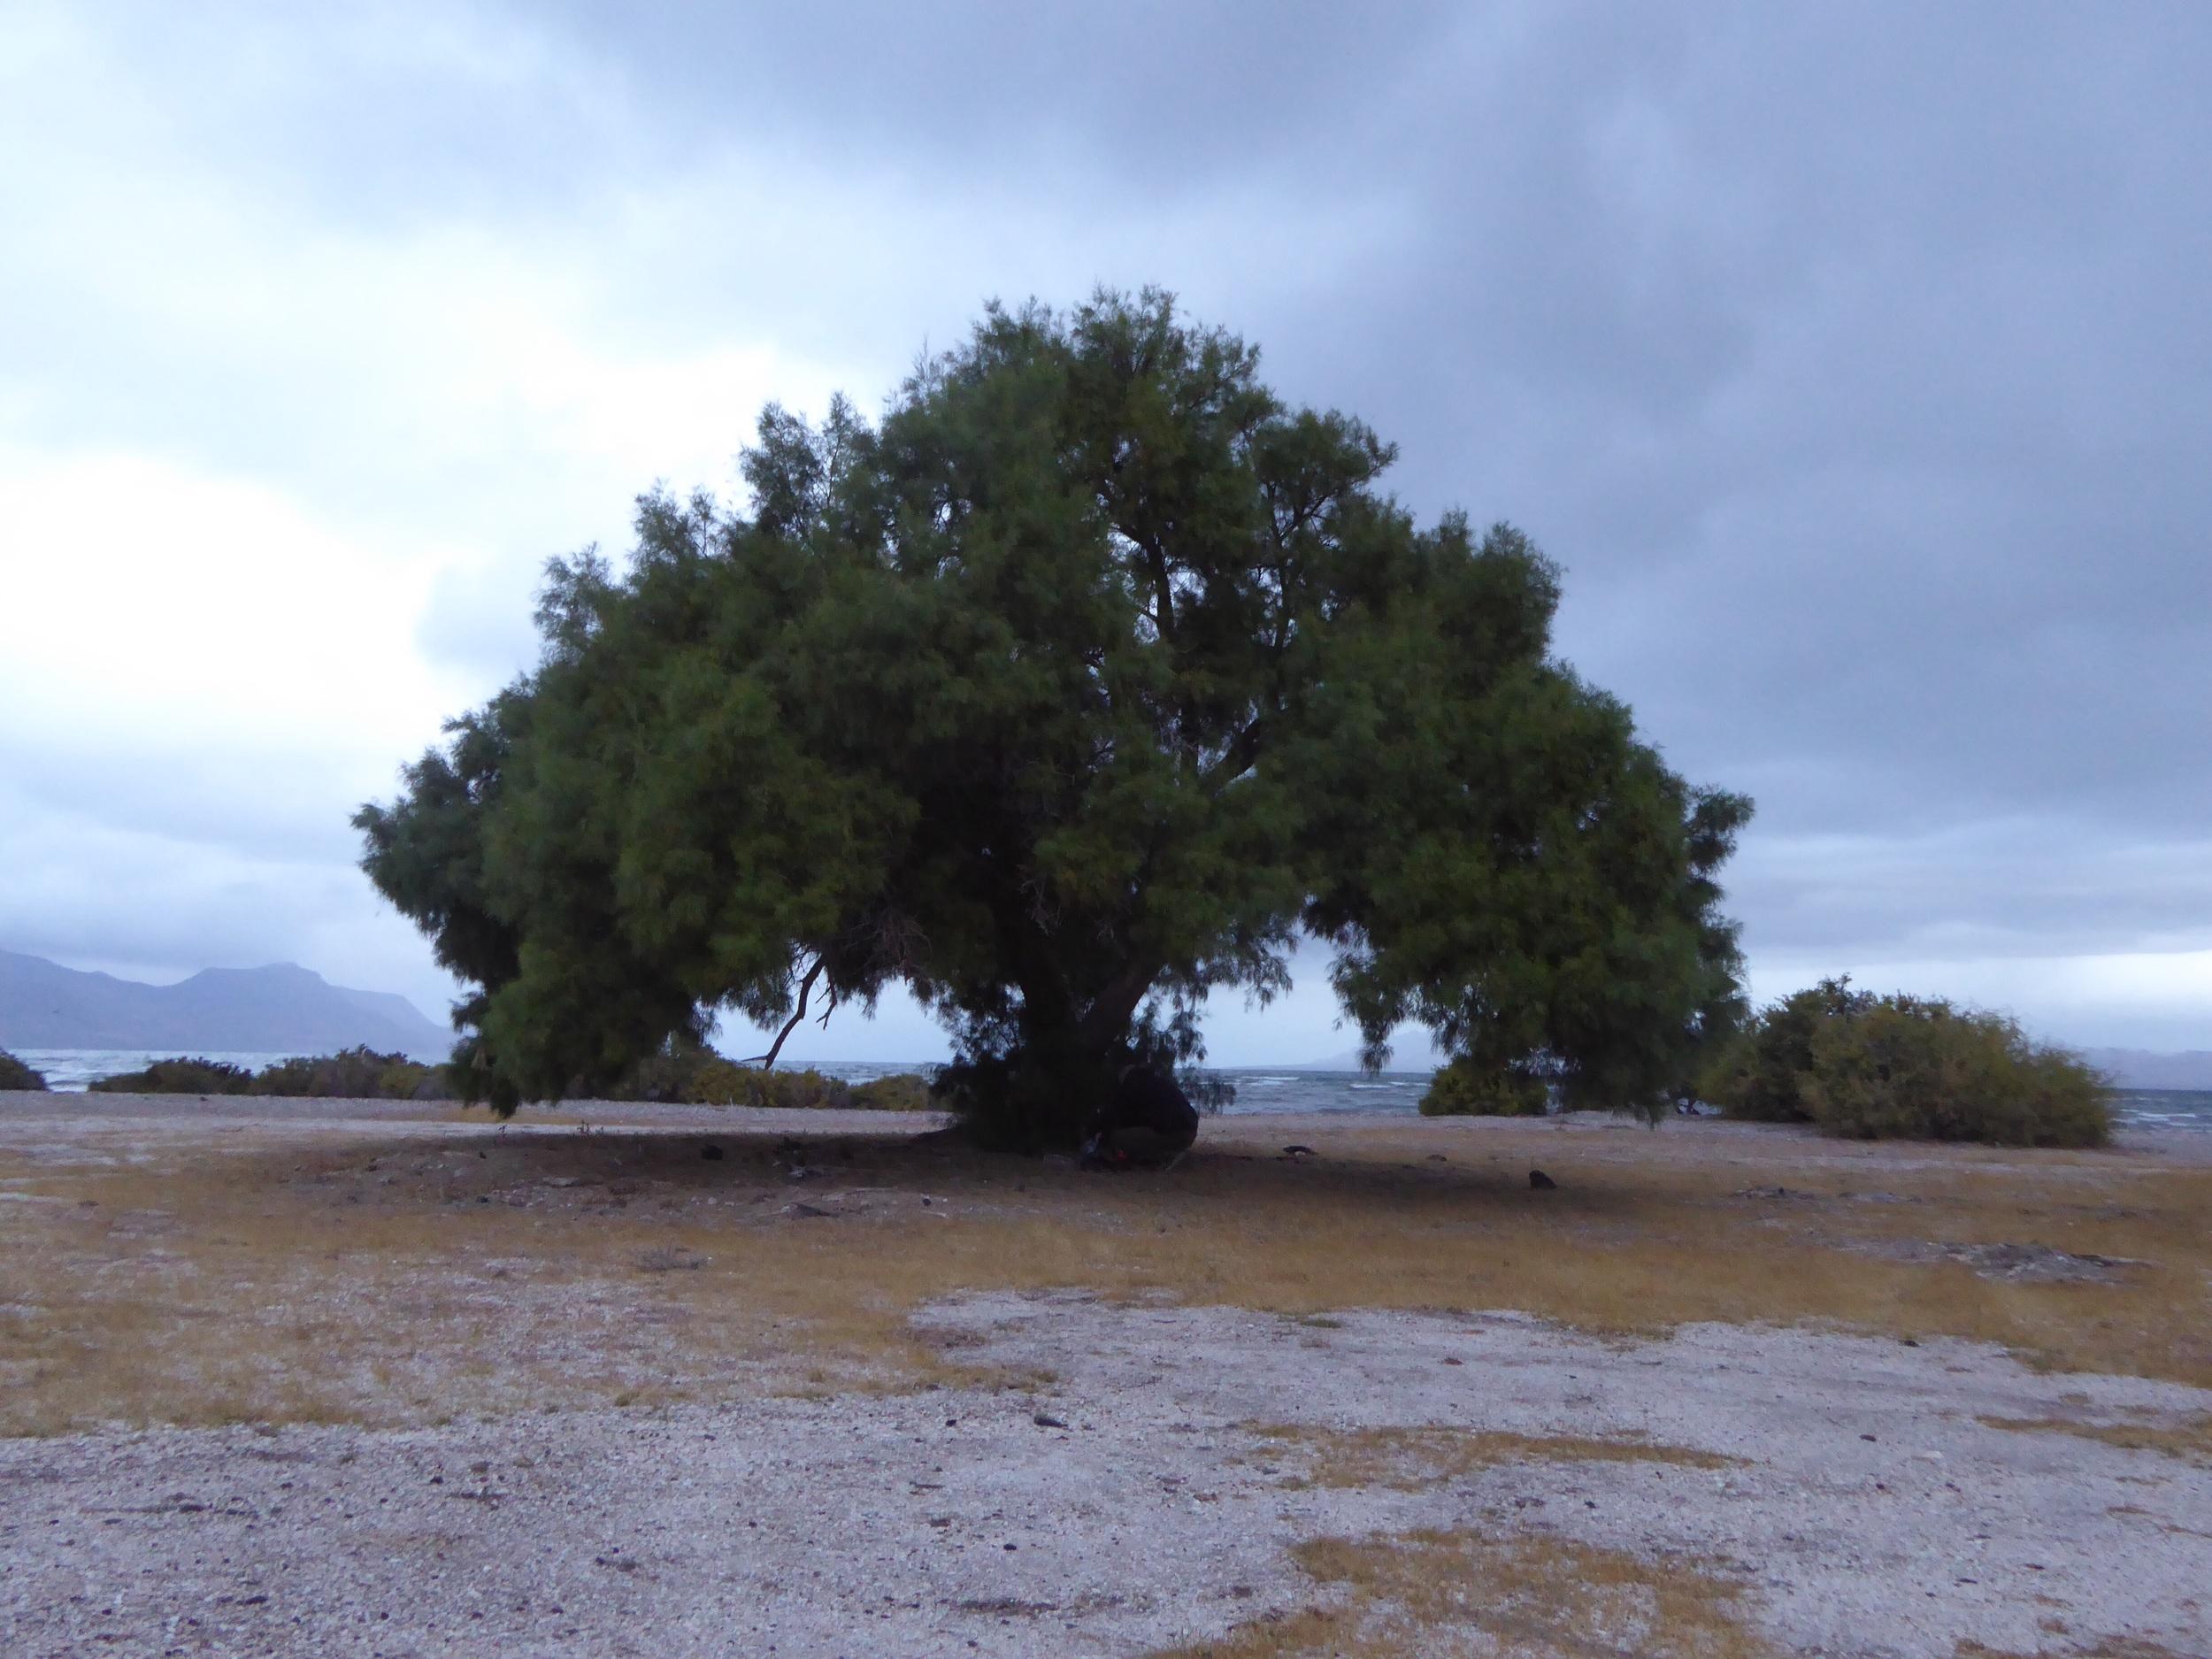 Our favorite Shake tree